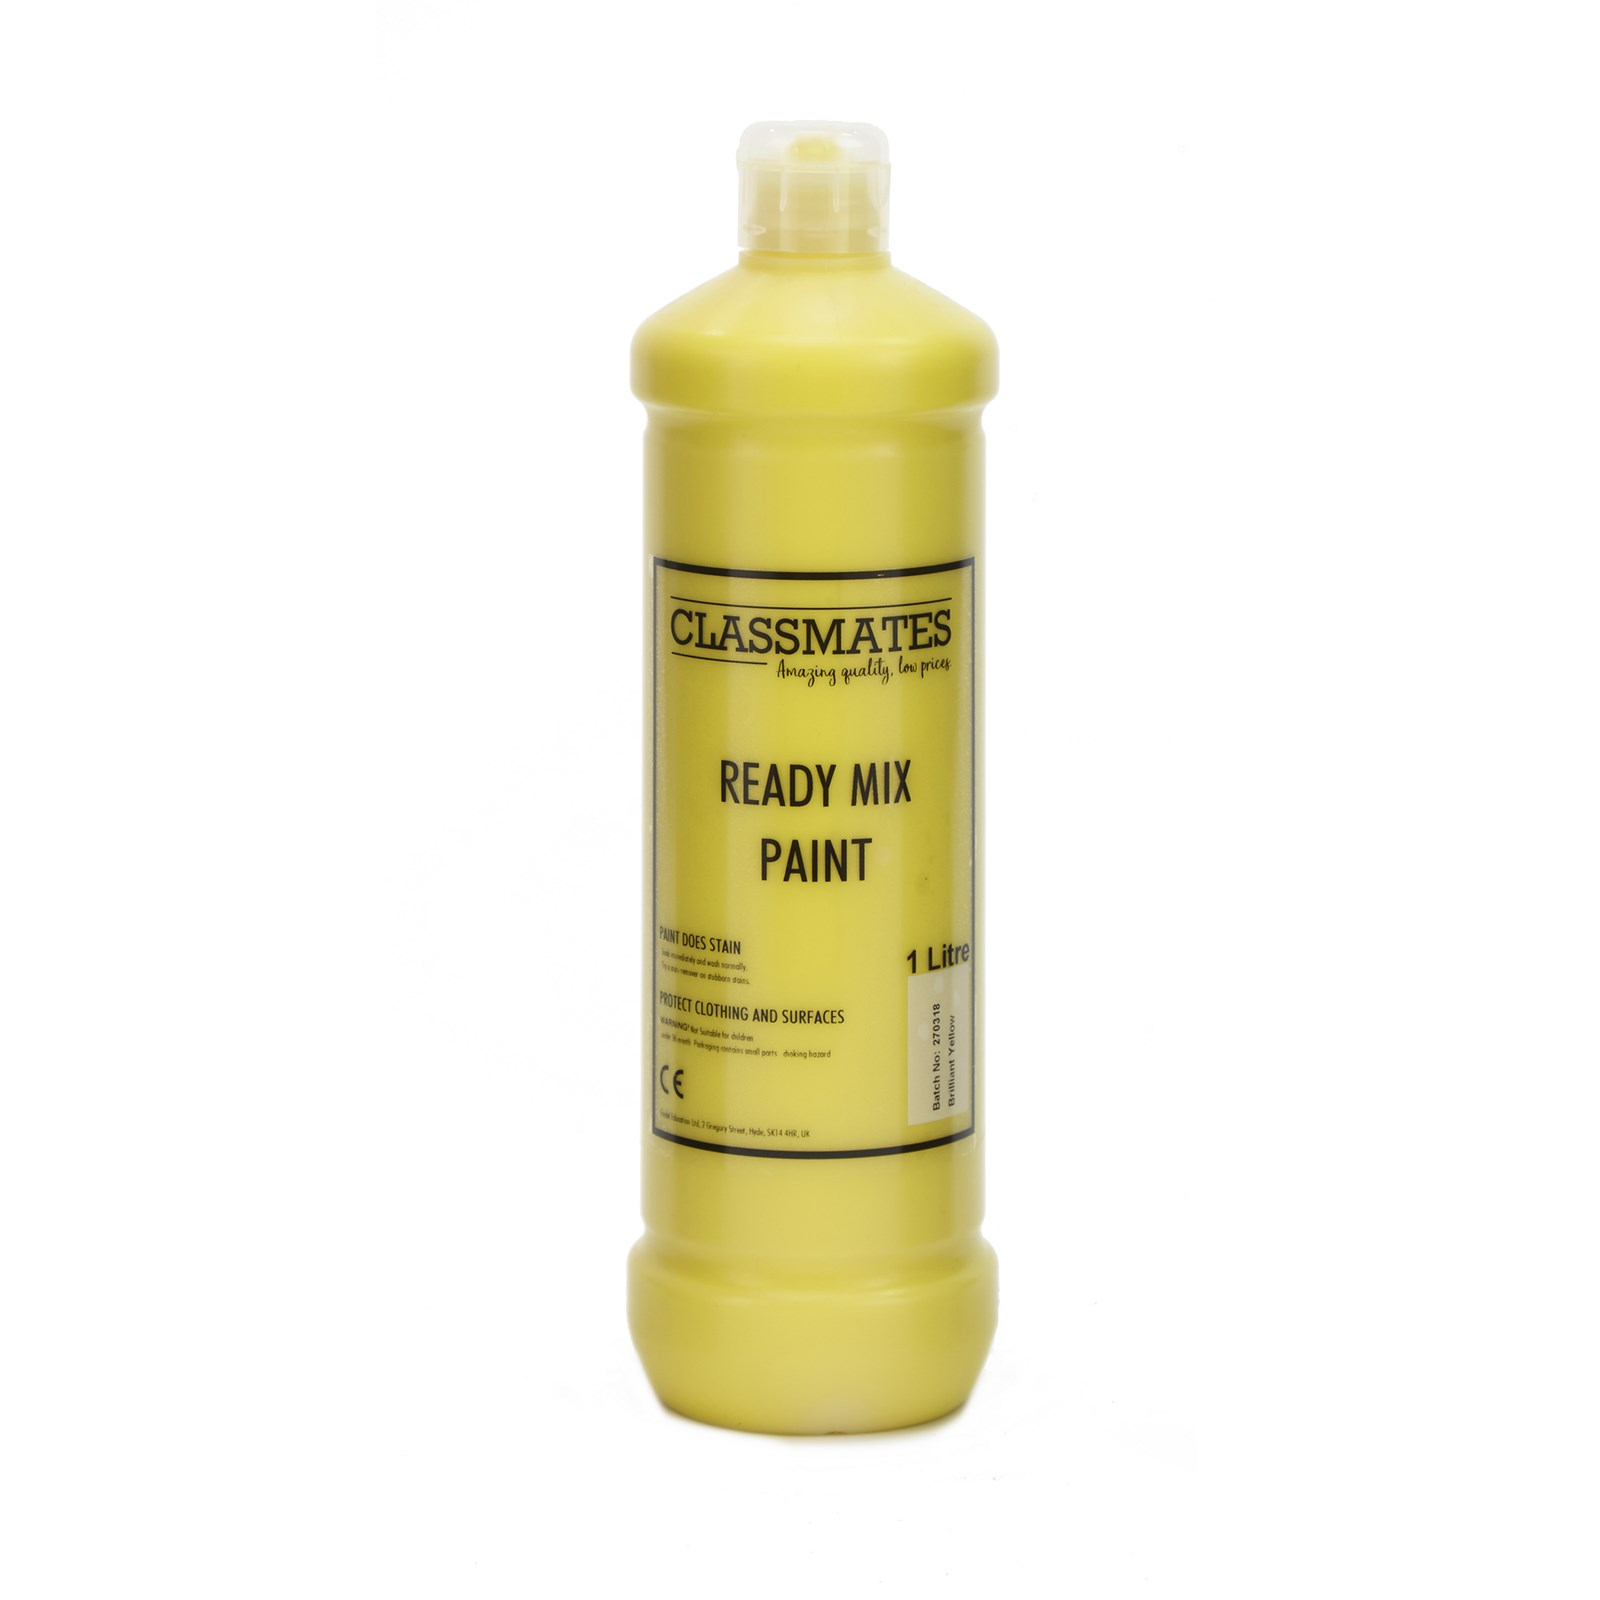 Classmates Ready Mixed Paint in Brilliant Yellow - 1 Litre Bottle